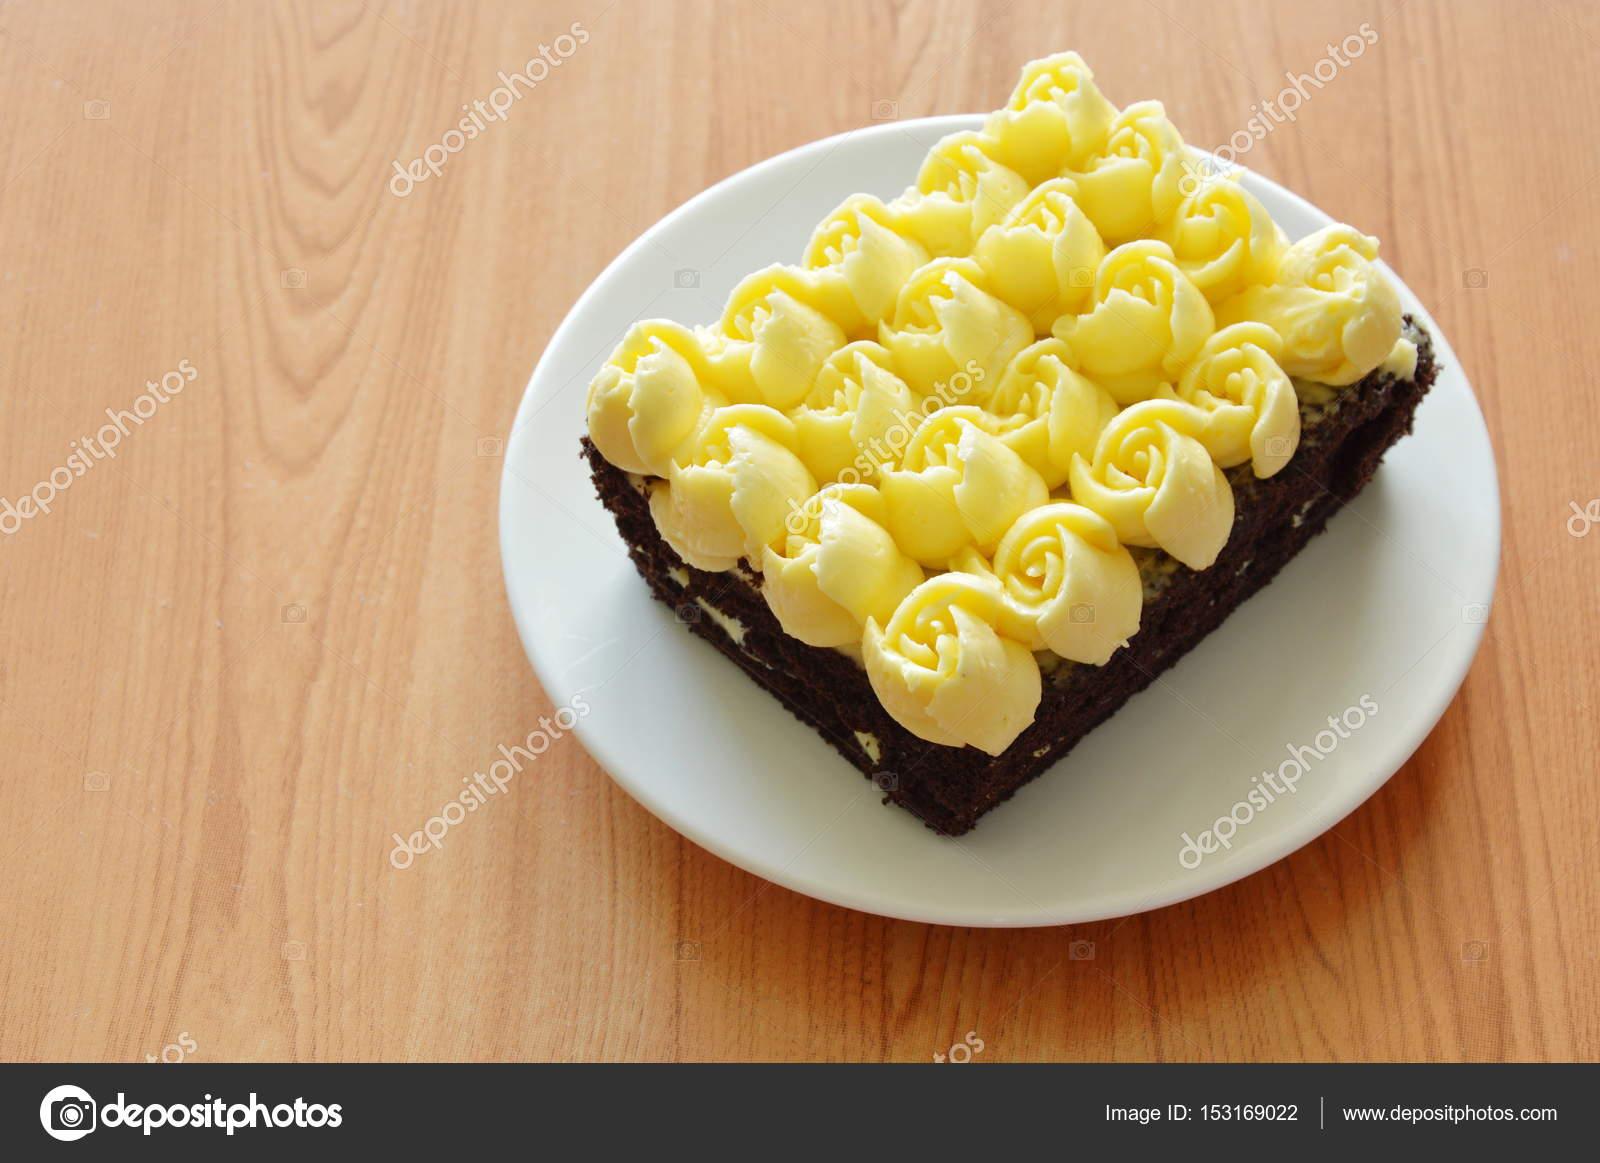 Sahne Verzieren Rosenblute Topping Schokolade Kuchen Auf Teller